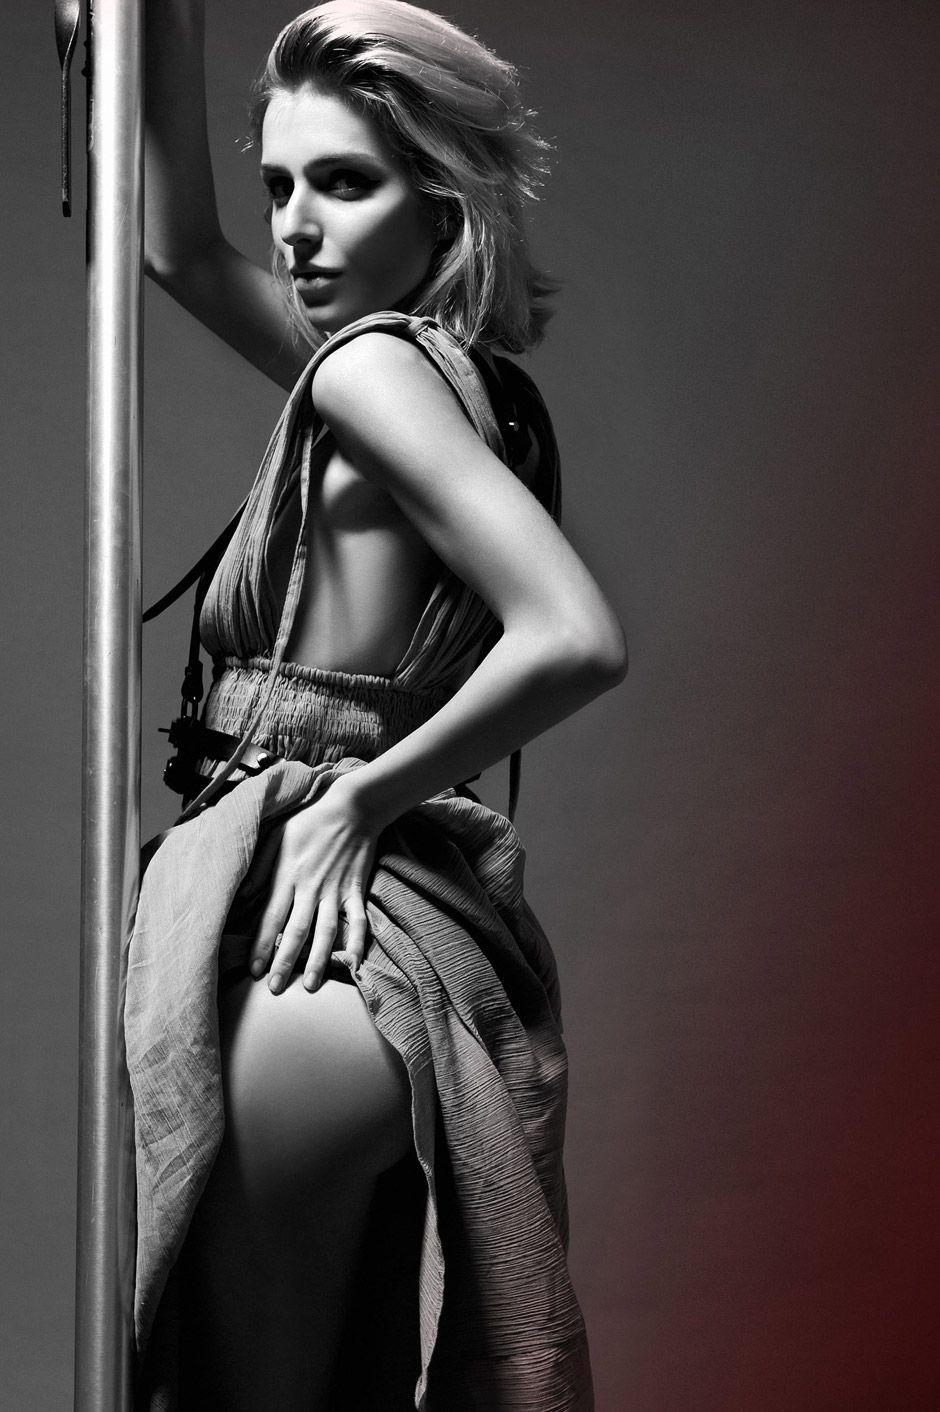 2019 Fernanda de Freitas nude (33 photo), Pussy, Leaked, Boobs, butt 2017